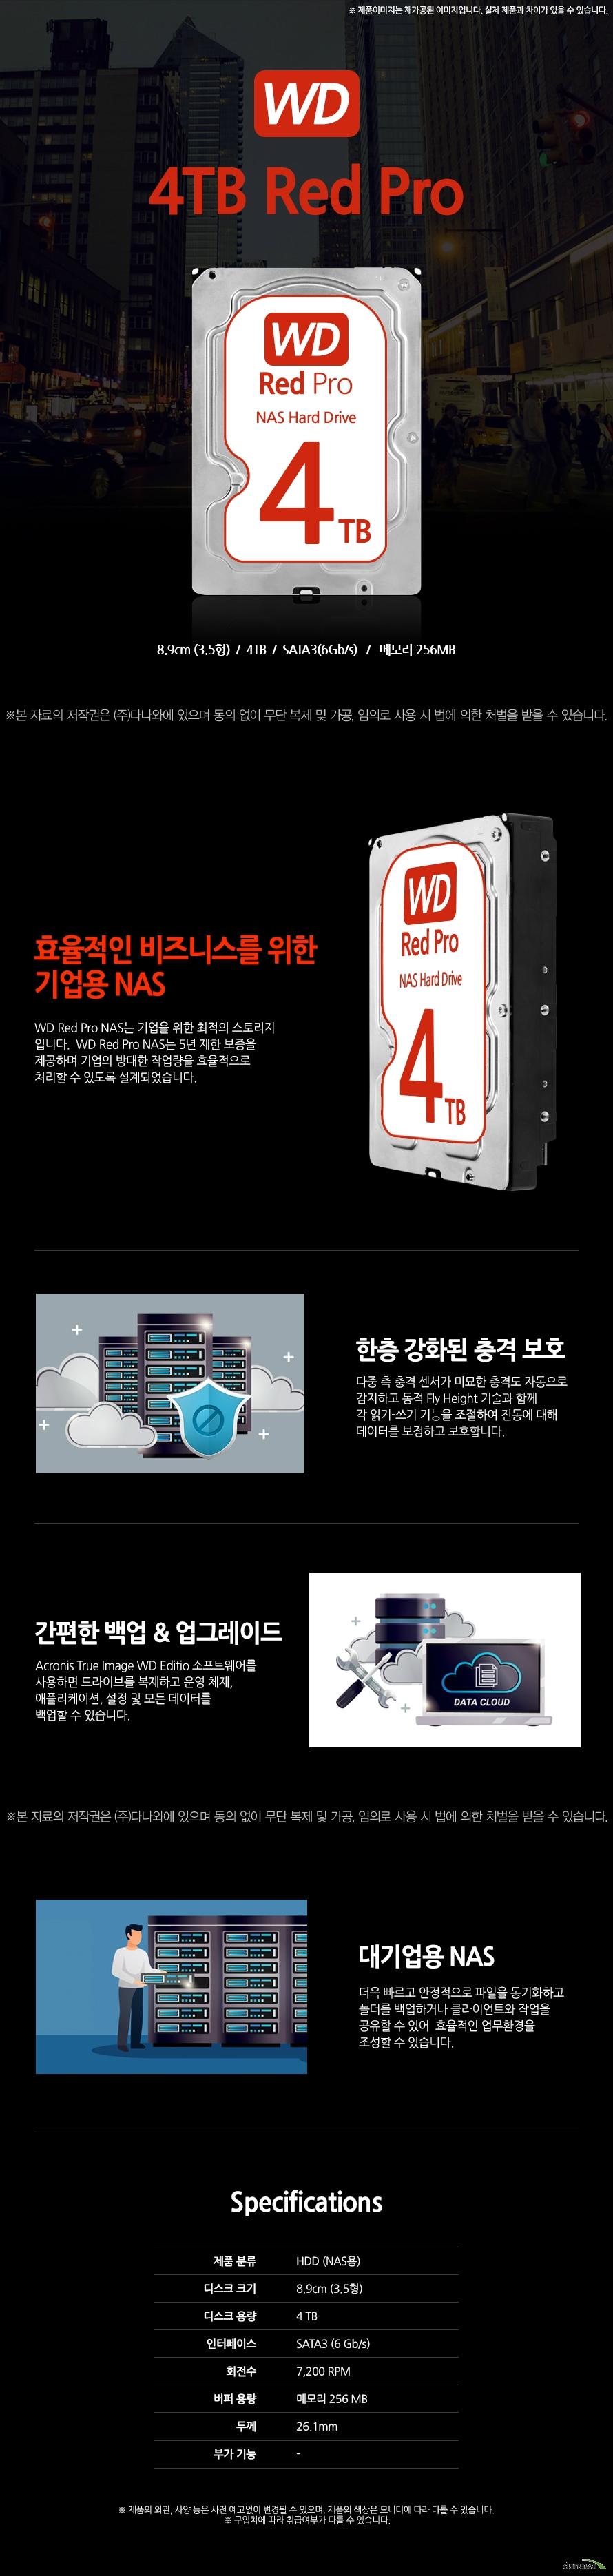 Western Digital WD 4TB Red Pro  8.9cm (3.5형)  4TB    SATA3(6Gb/s)      메모리 256MB 효율적인 비즈니스를 위한 기업용 NAS WD Red Pro NAS는 기업을 위한 최적의 스토리지 입니다.  WD Red Pro NAS는 5년 제한 보증을 제공하며 기업의 방대한 작업량을 효율적으로  처리할 수 있도록 설계되었습니다. 한층 강화된 충격 보호 다중 축 충격 센서가 미묘한 충격도 자동으로 감지하고 동적 Fly Height 기술과 함께 각 읽기-쓰기 기능을 조절하여 진동에 대해 데이터를 보정하고 보호합니다. 간편한 백업 & 업그레이드 Acronis True Image WD Editio 소프트웨어를 사용하면 드라이브를 복제하고 운영 체제, 애플리케이션, 설정 및 모든 데이터를  백업할 수 있습니다. 대기업용 NAS 더욱 빠르고 안정적으로 파일을 동기화하고 폴더를 백업하거나 클라이언트와 작업을 공유할 수 있어  효율적인 업무환경을 조성할 수 있습니다.